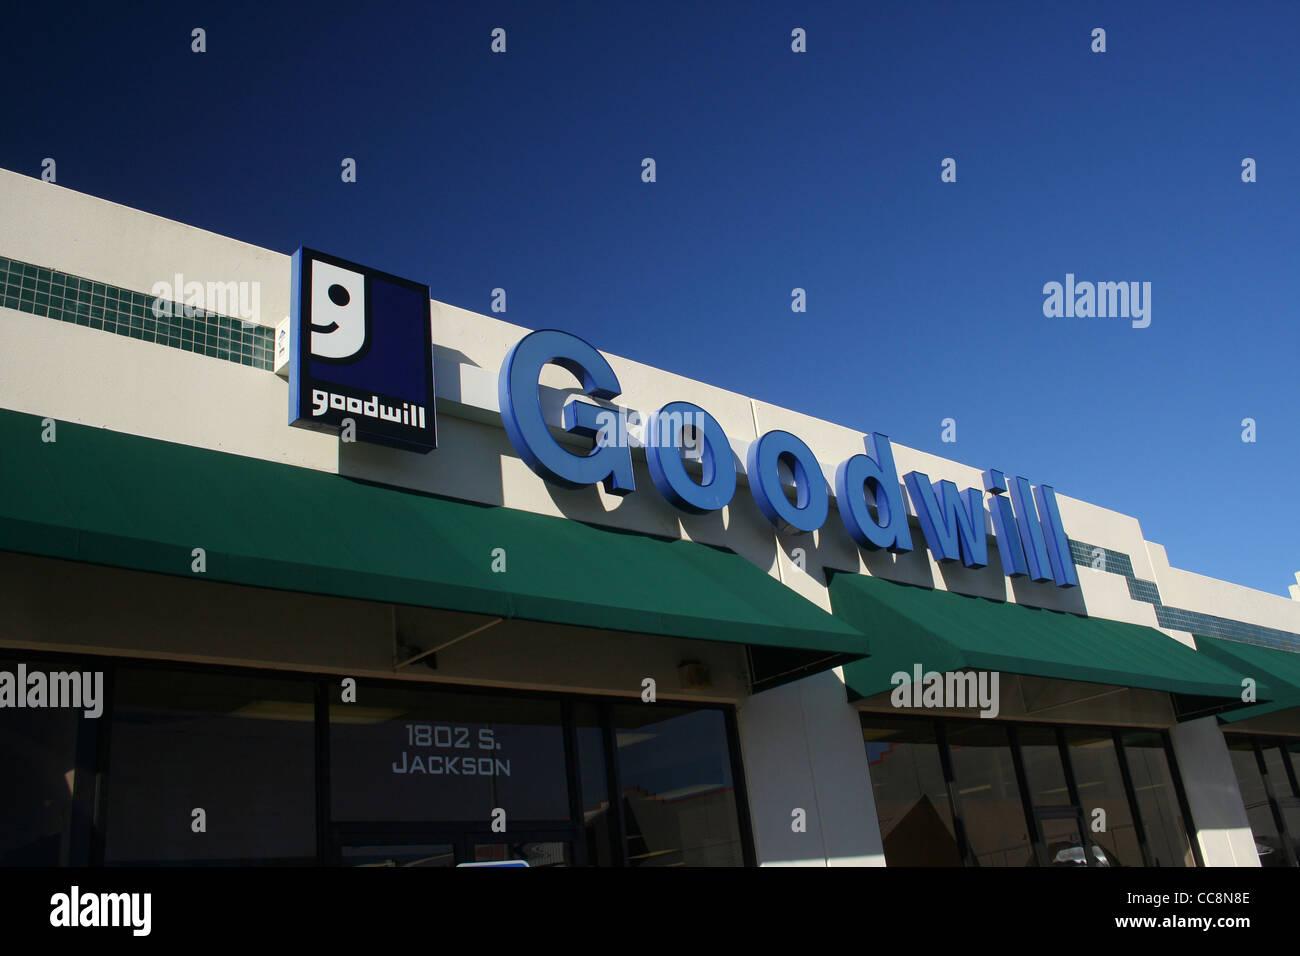 Goodwill - Jacksonville, TX - January 2012 - Stock Image